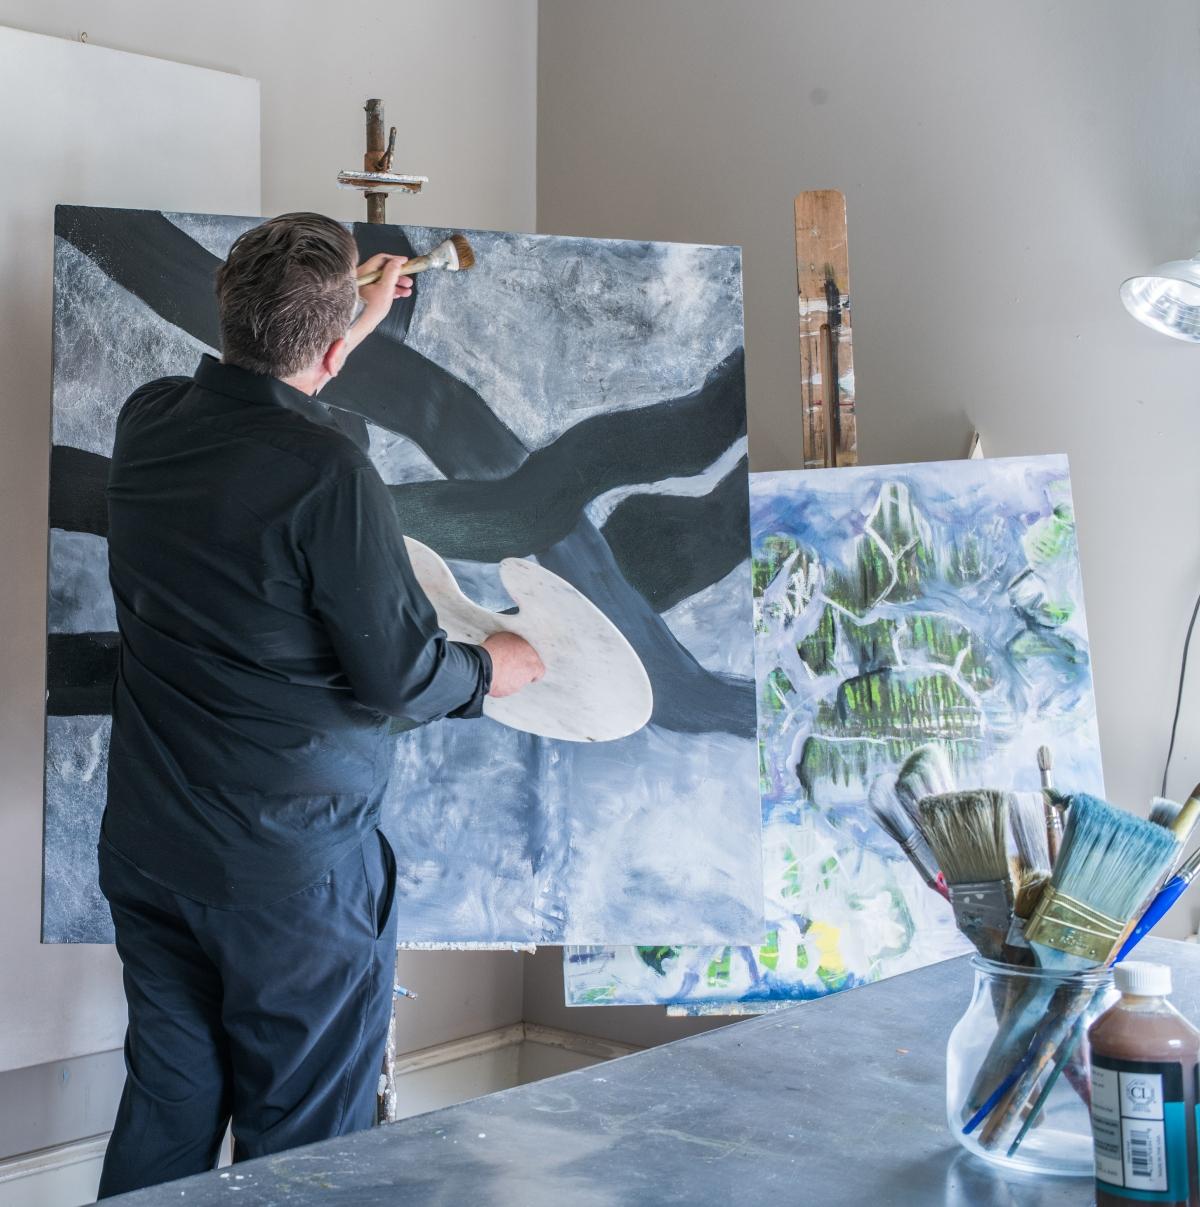 Artist and Designer John Ishmael in his Home Studio